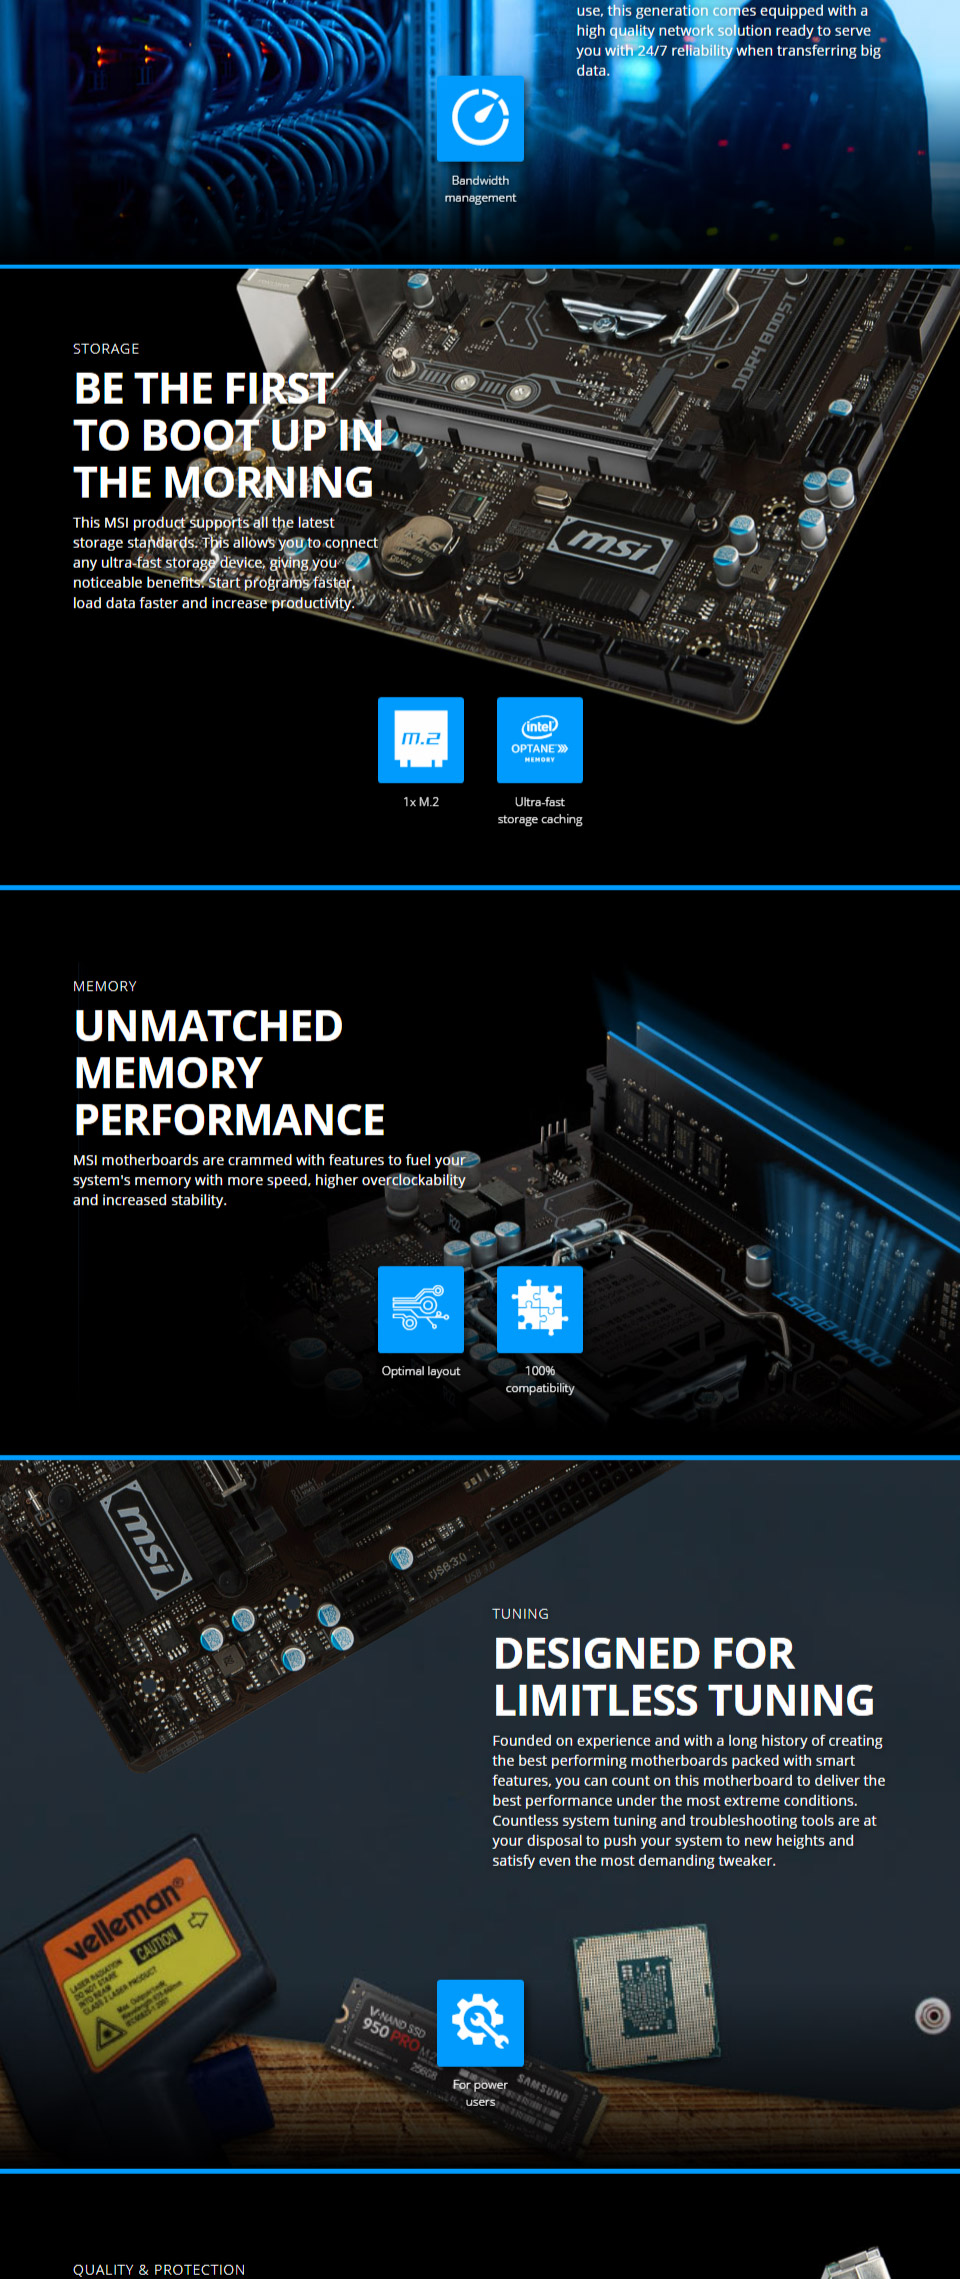 MSI B250M Pro VD Motherboard [MSI-B250M-PRO-VD] : PC Case Gear